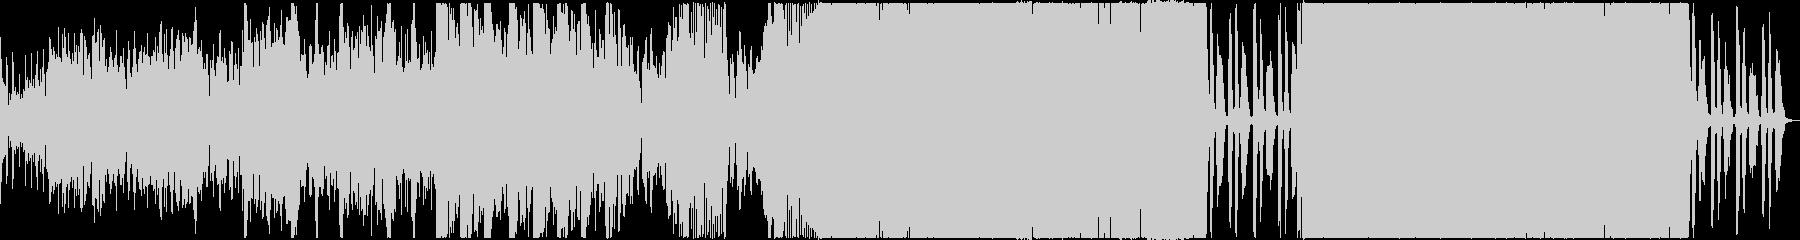 Skiffle Songの未再生の波形